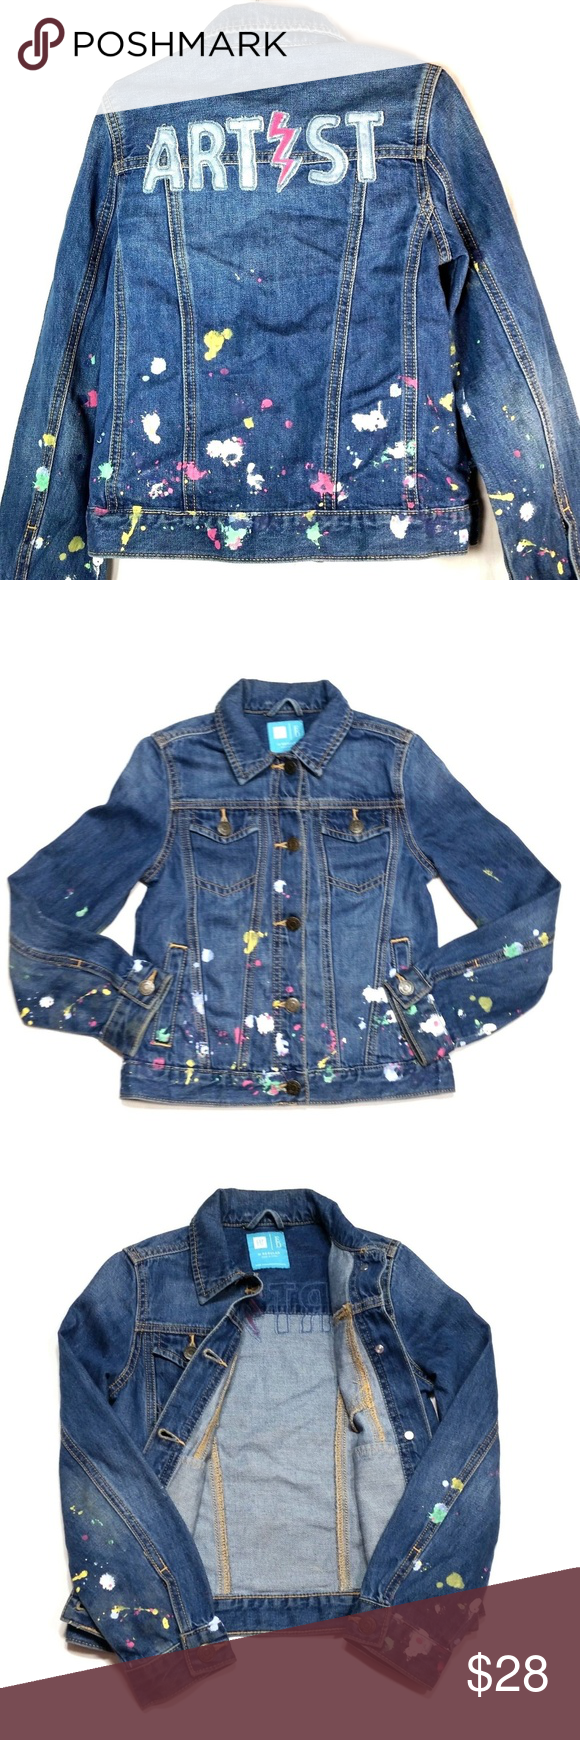 Gap Kids Ed Denim Jean Jacket Girls M 8 9 Gap Kids Ed Denim Jean Jacket Girls M 8 9 Usable Condition Hole On Front Jean Jacket For Girls Kids Fashion Fashion [ 1740 x 580 Pixel ]